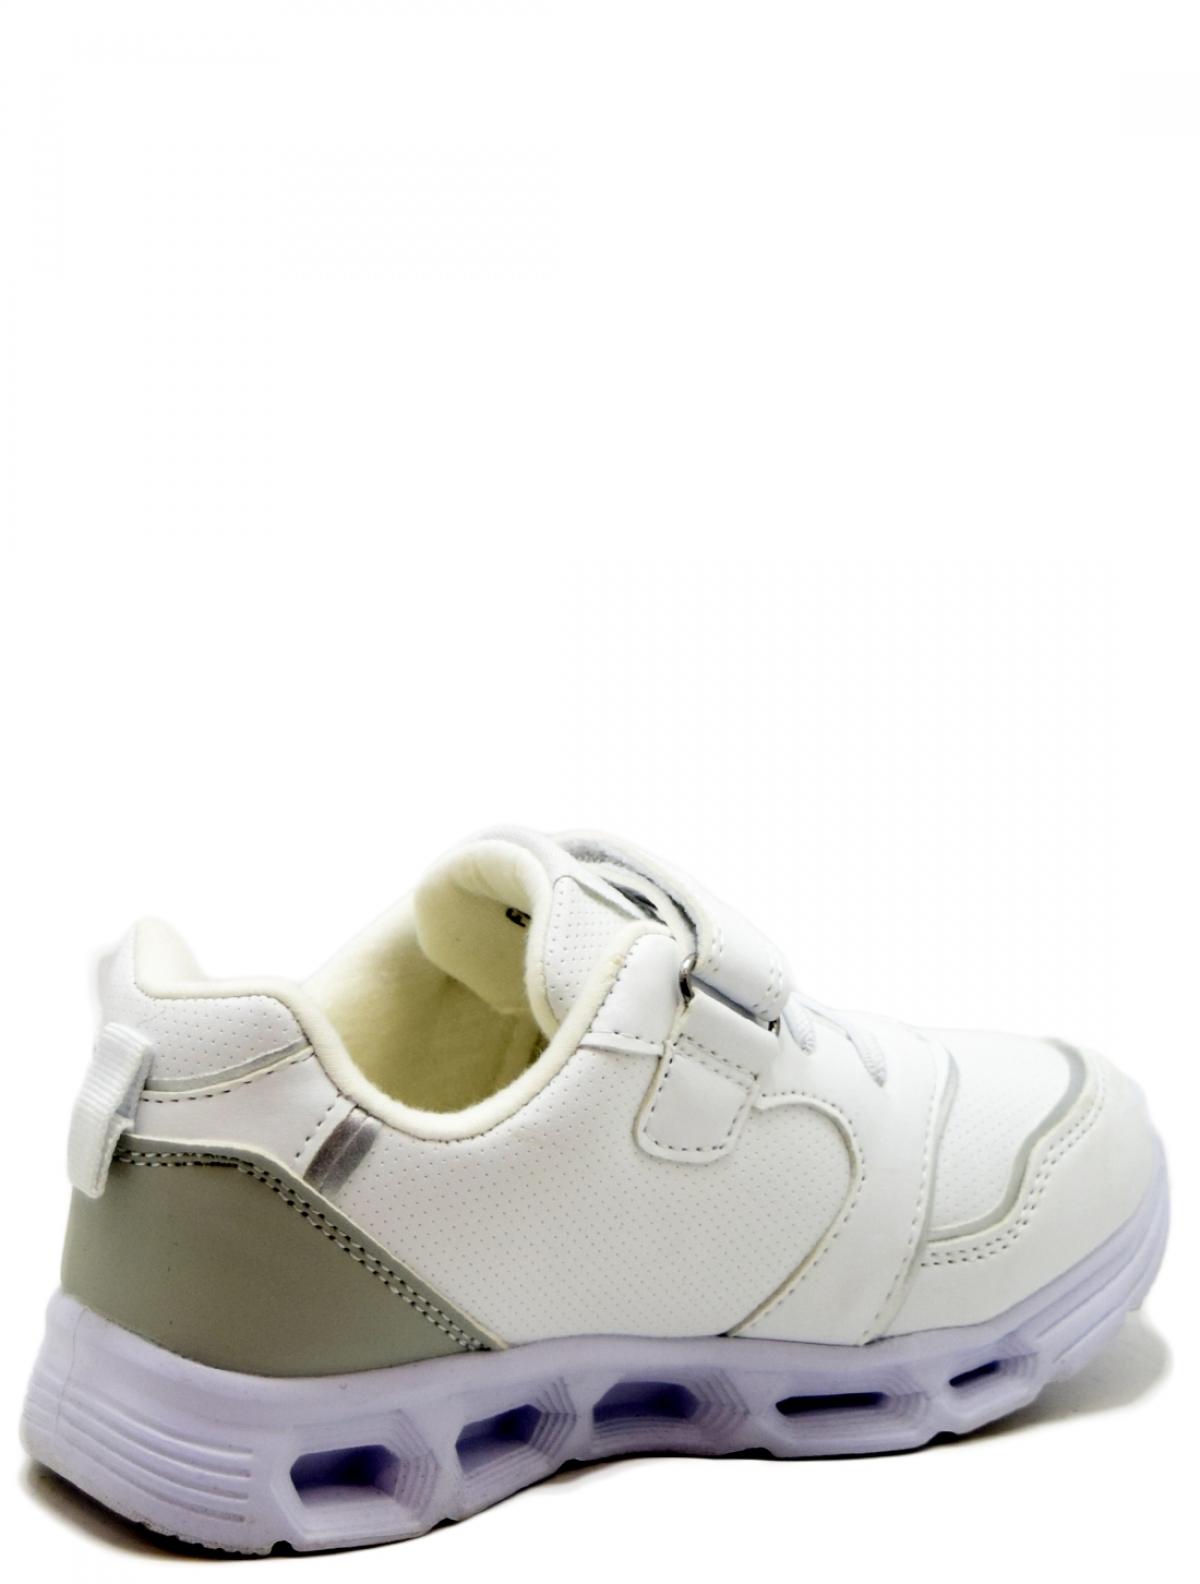 Ulet FL219-L04-7 кроссовки для девочки